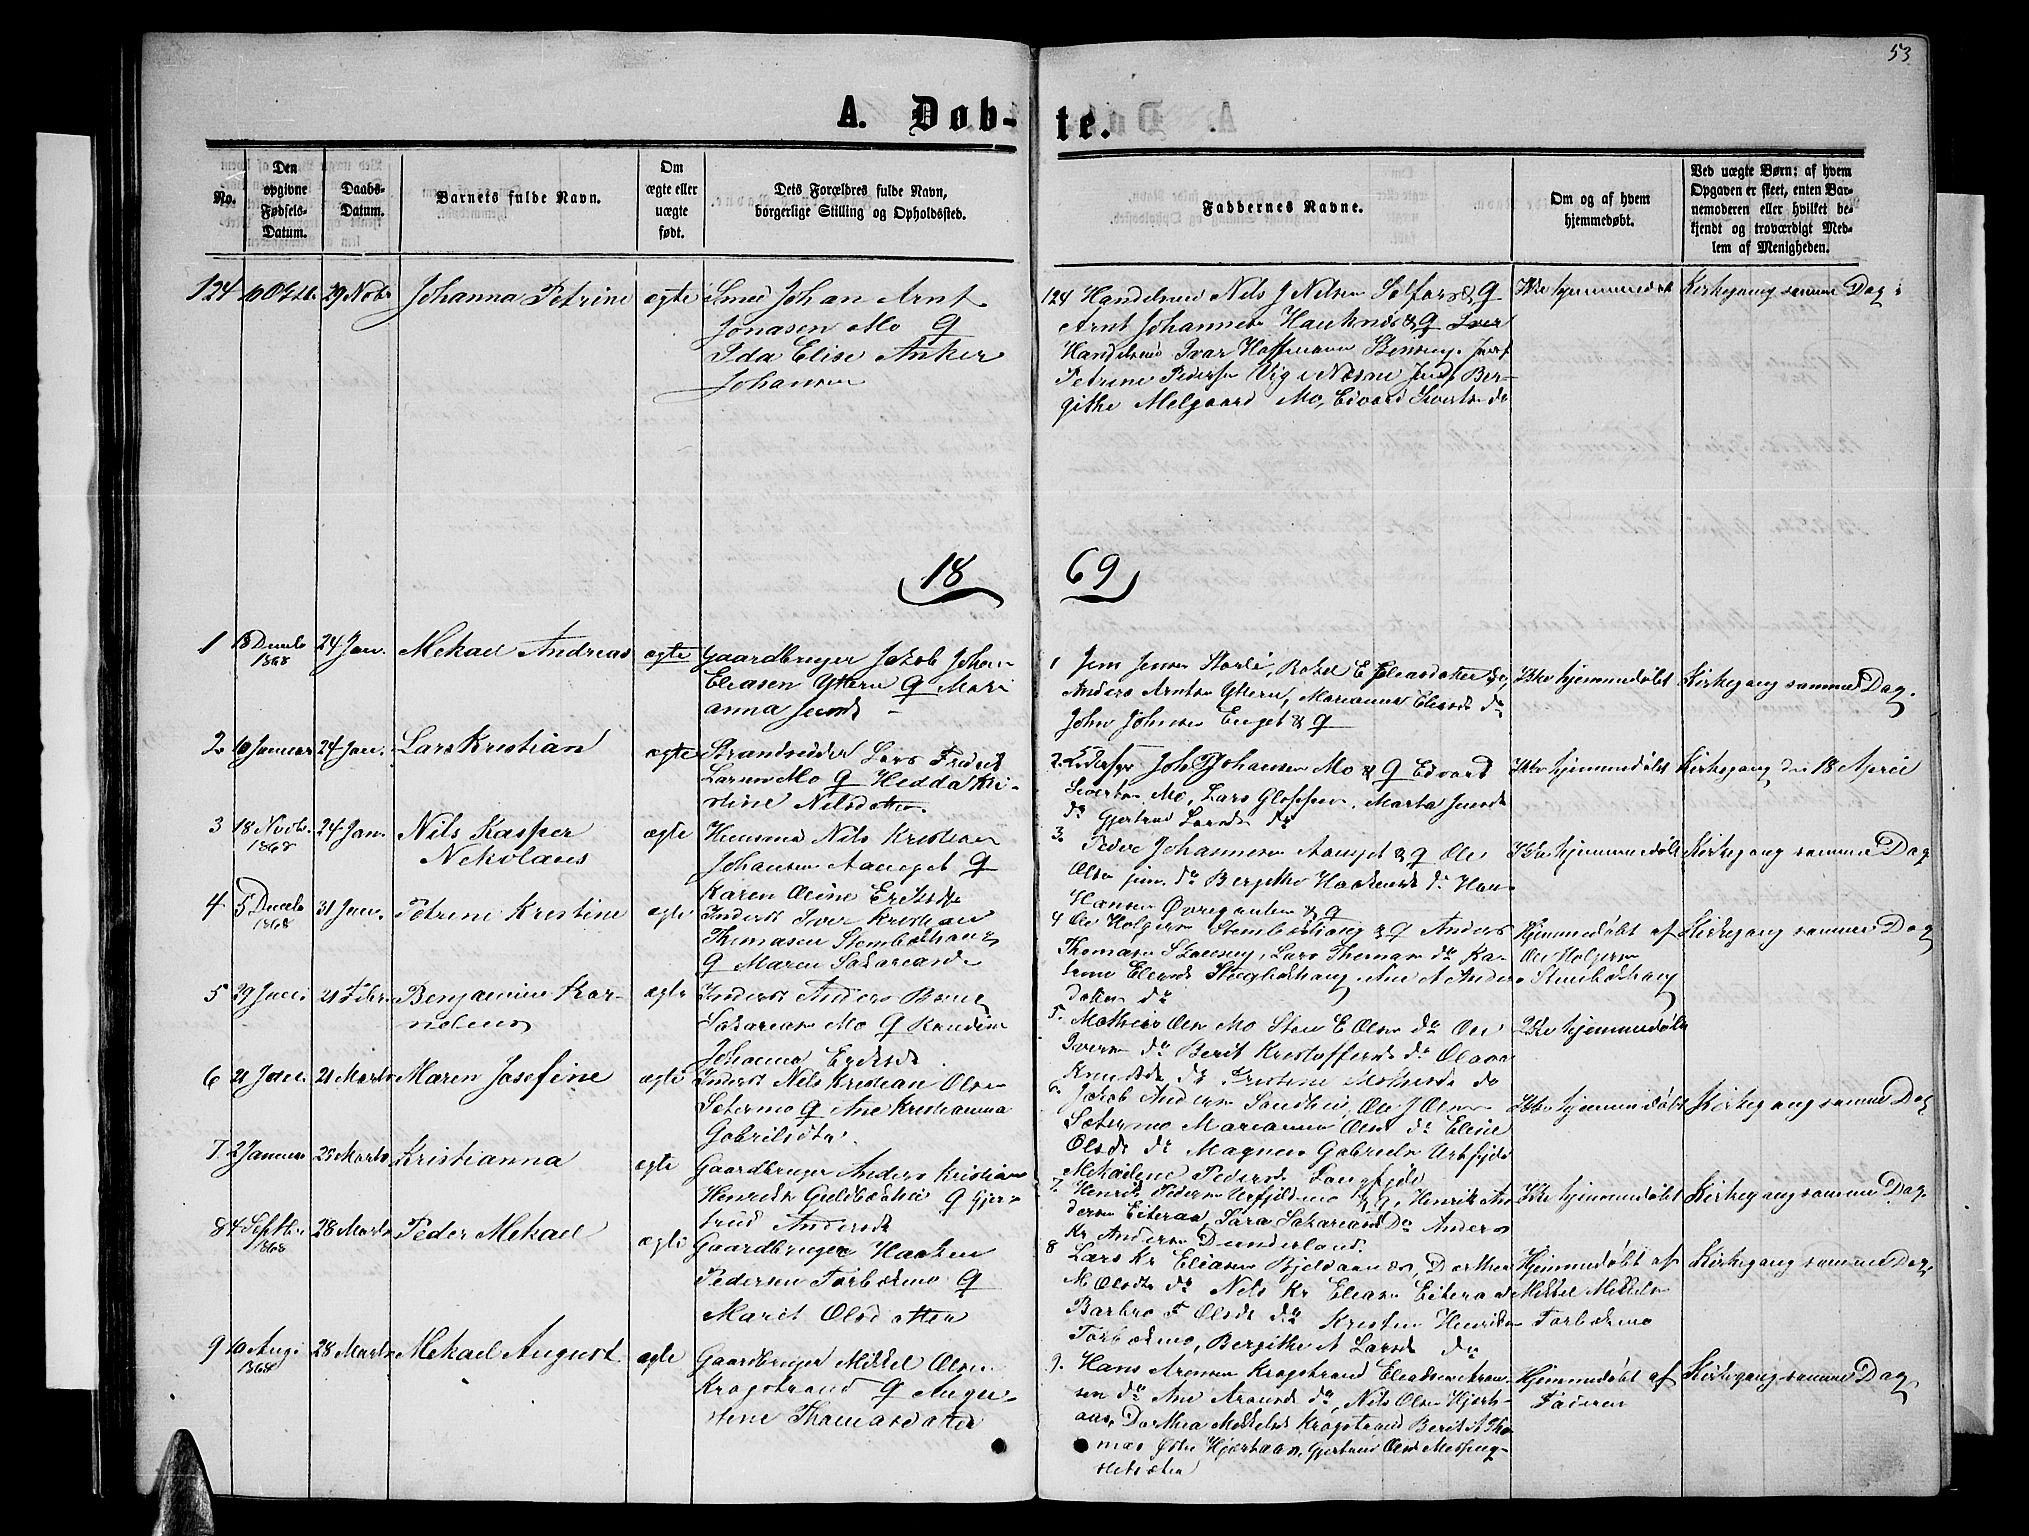 SAT, Ministerialprotokoller, klokkerbøker og fødselsregistre - Nordland, 827/L0415: Klokkerbok nr. 827C04, 1864-1886, s. 53